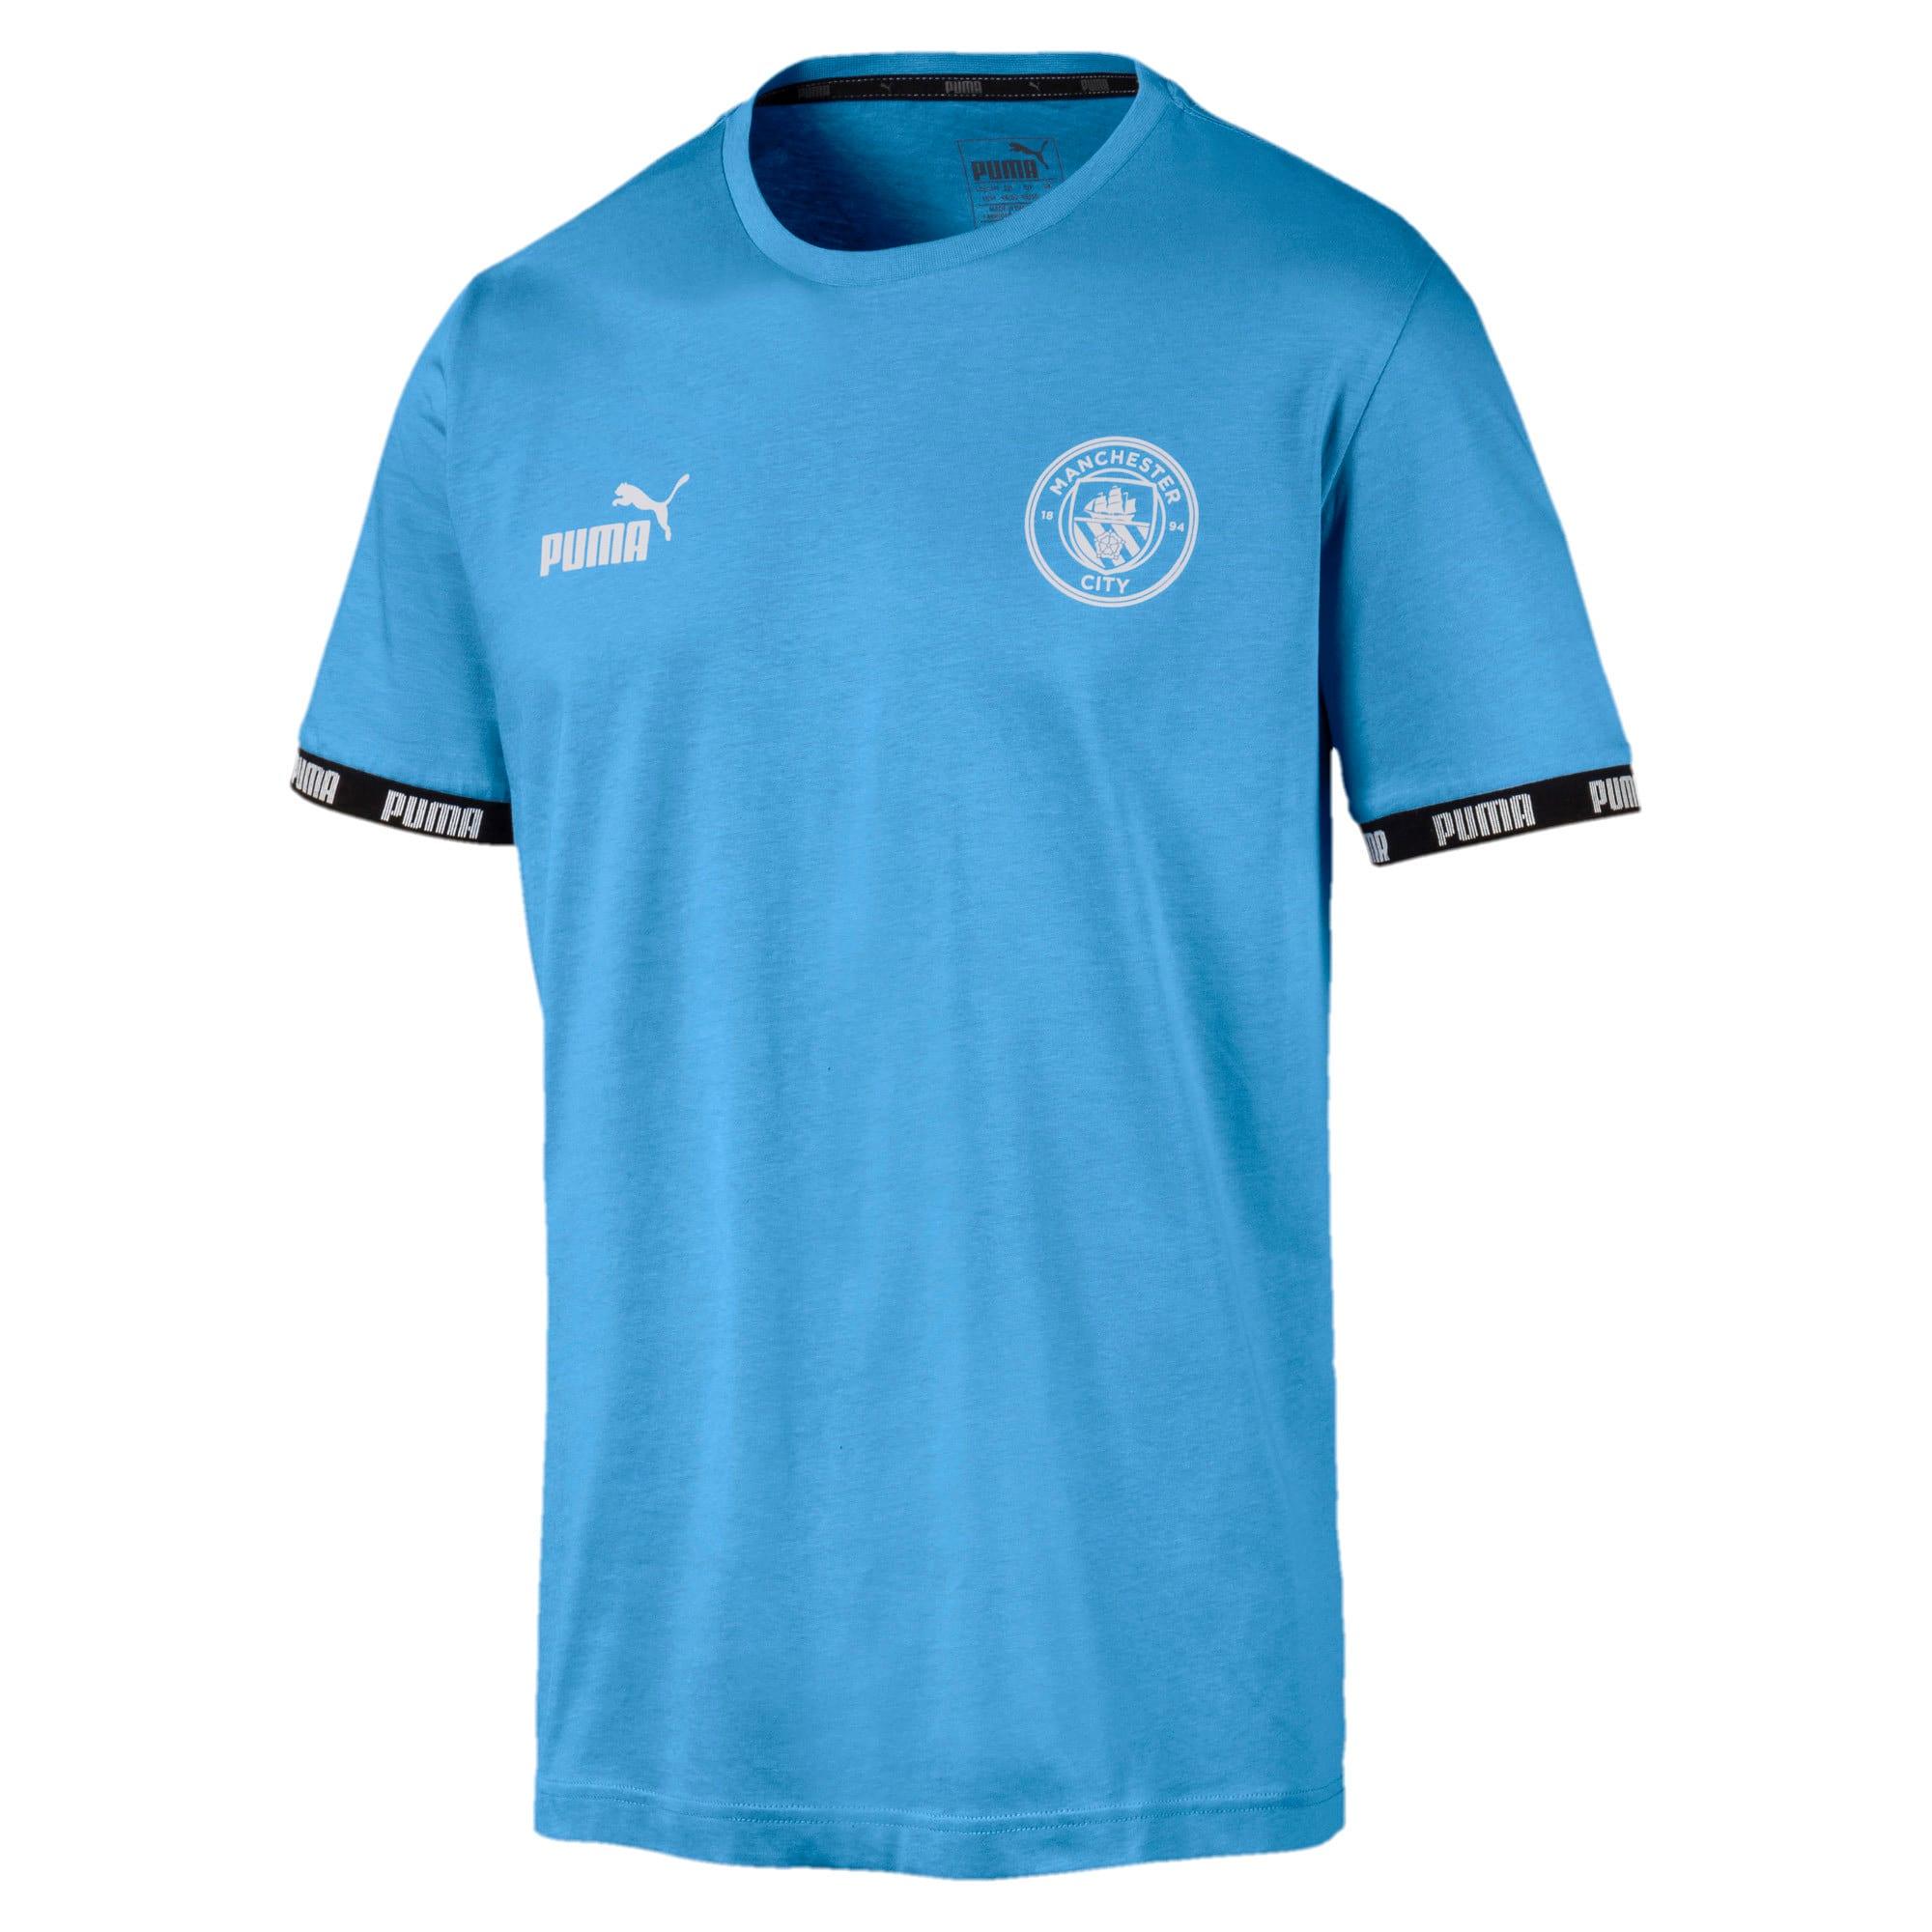 Thumbnail 1 of Man City Men's Football Culture Tee, Team Light Blue, medium